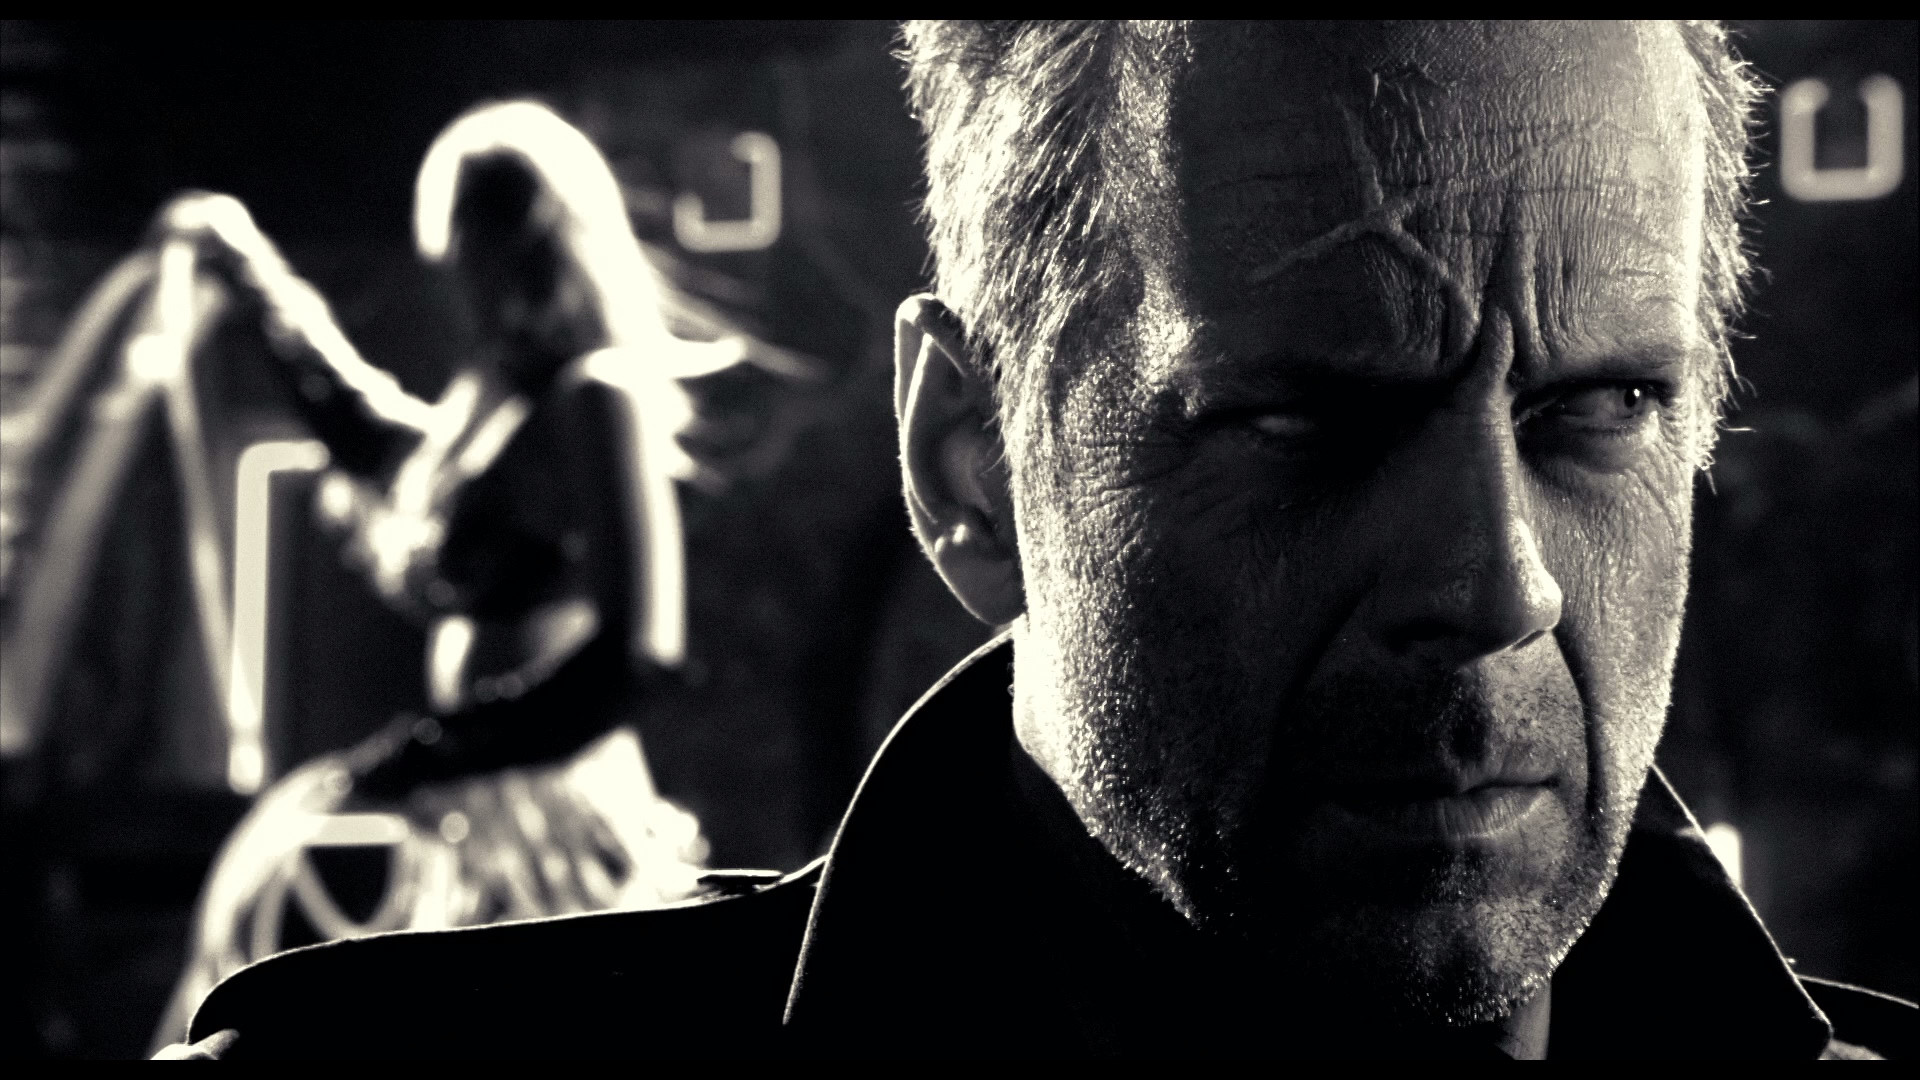 Sin City HD wallpapers, Desktop wallpaper - most viewed